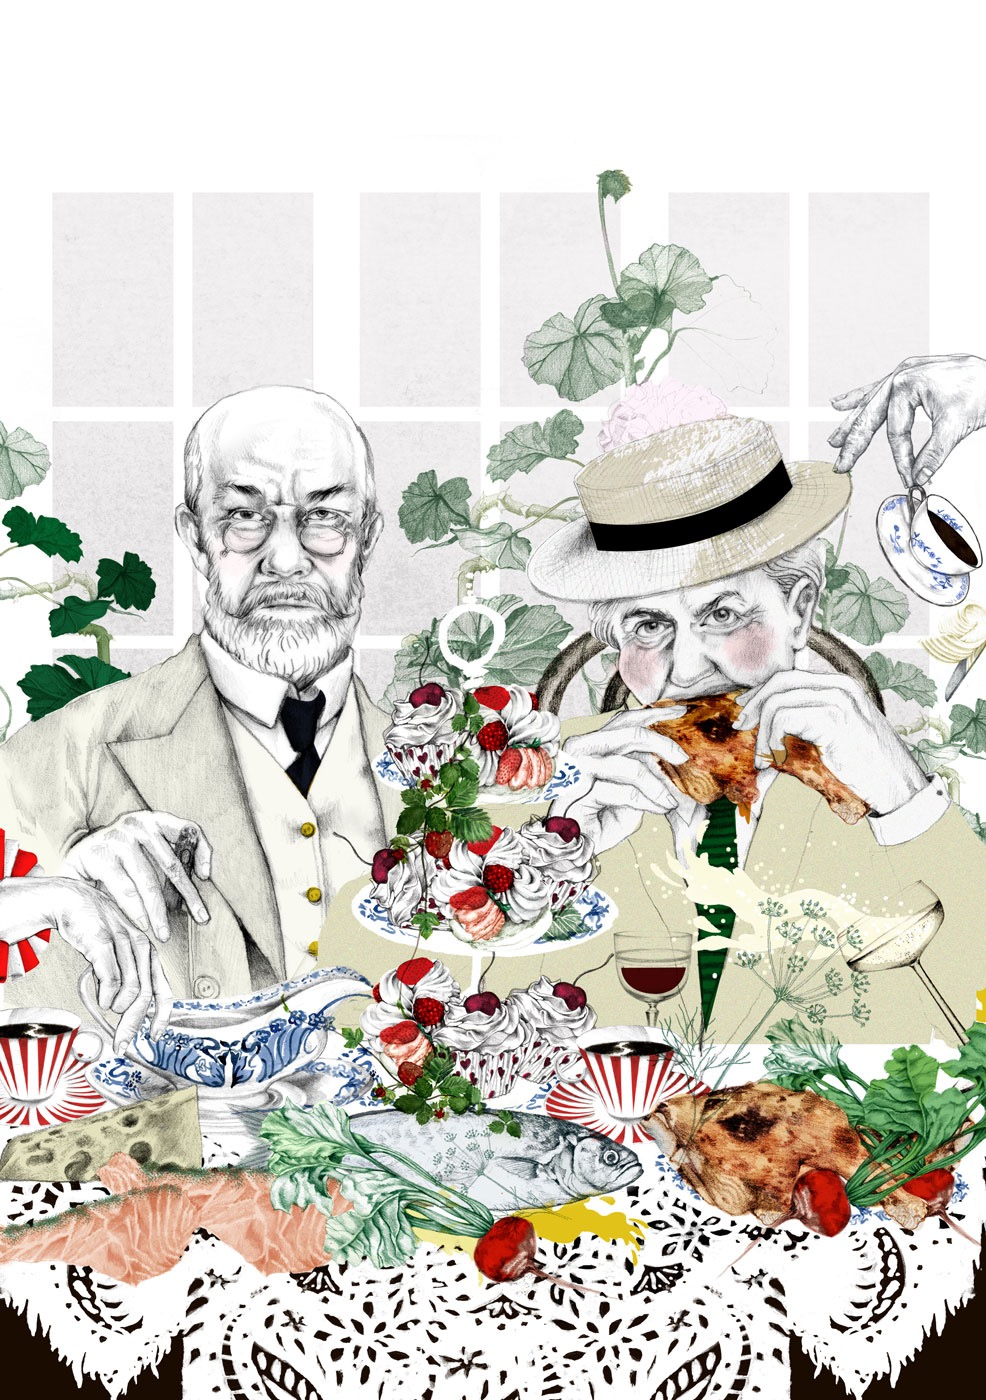 illustrator, illustrators, illustration, illustrations, man, men, woman, women, eating, couple, tea, wine, beverages, lace, doily, leaf, leaves, fish, glasses, suit, hat, hats, cup, cups, cupcake, cupcakes